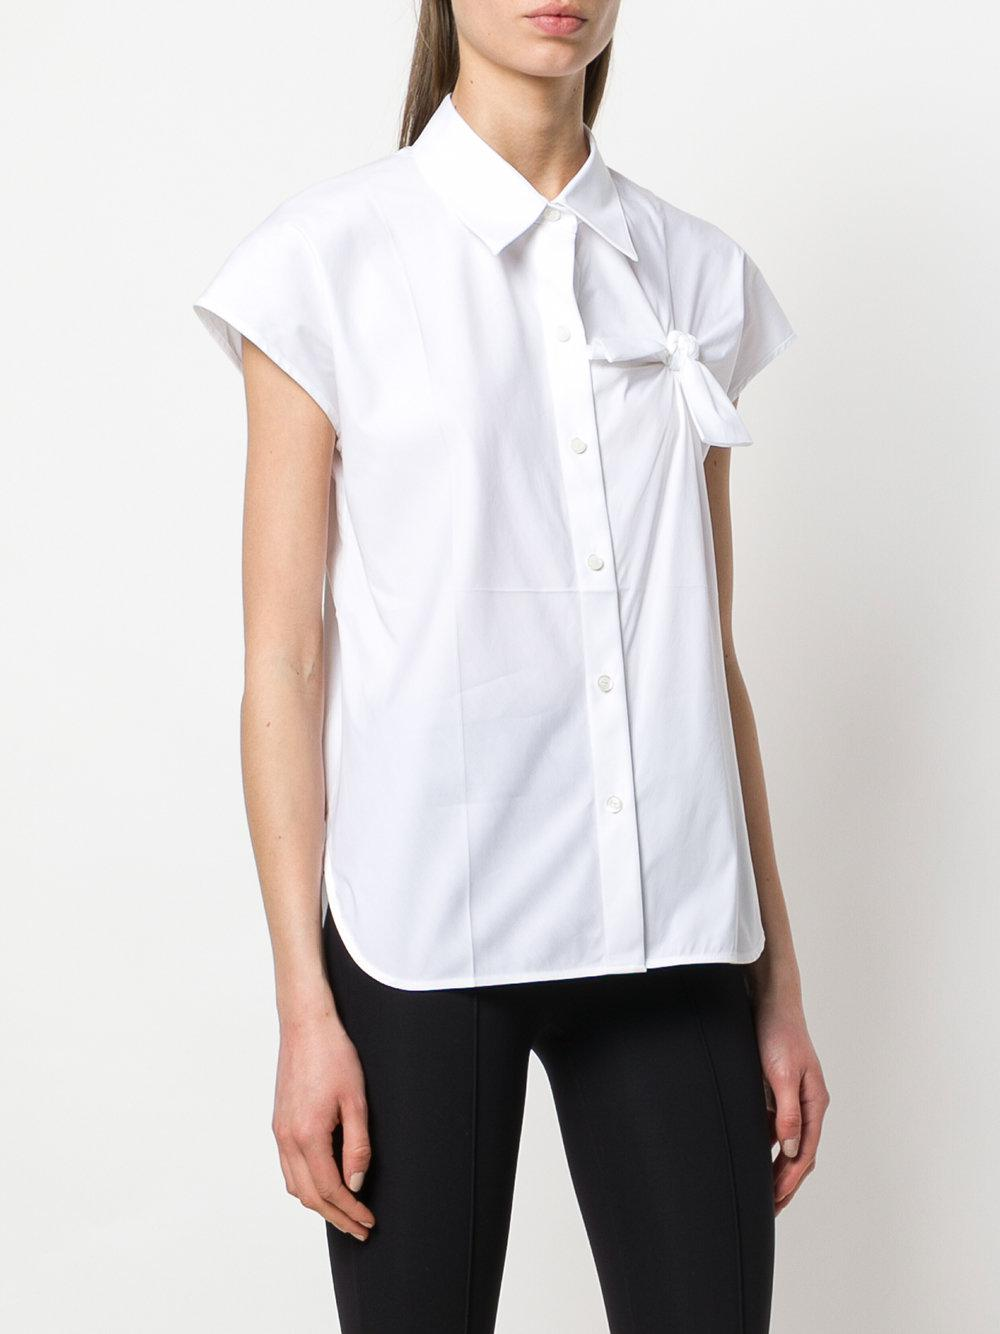 3a90557c9fc Lyst Helmut Knot Shirt Lang Chest White qXXwA6R